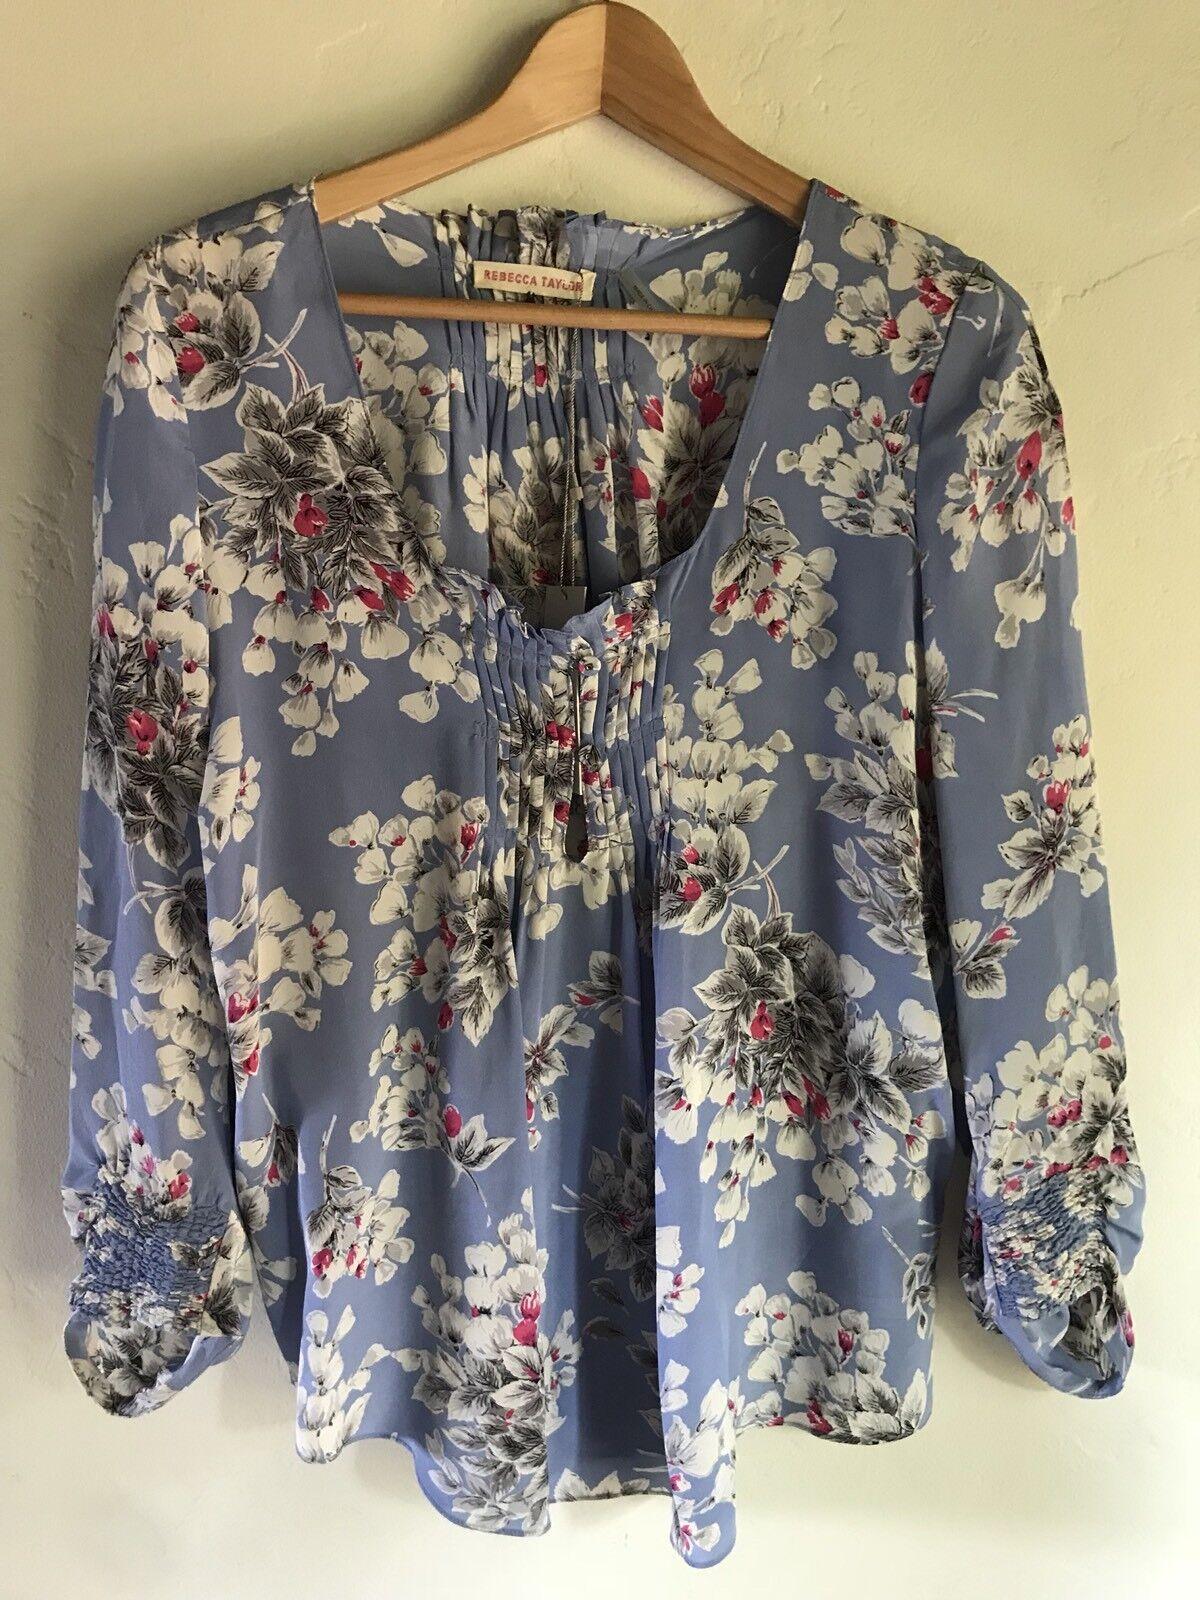 NEW 315 Rebecca Taylor Multi-Farbe Floral Blossom Silk Blouse Größe 10 GORGEOUS